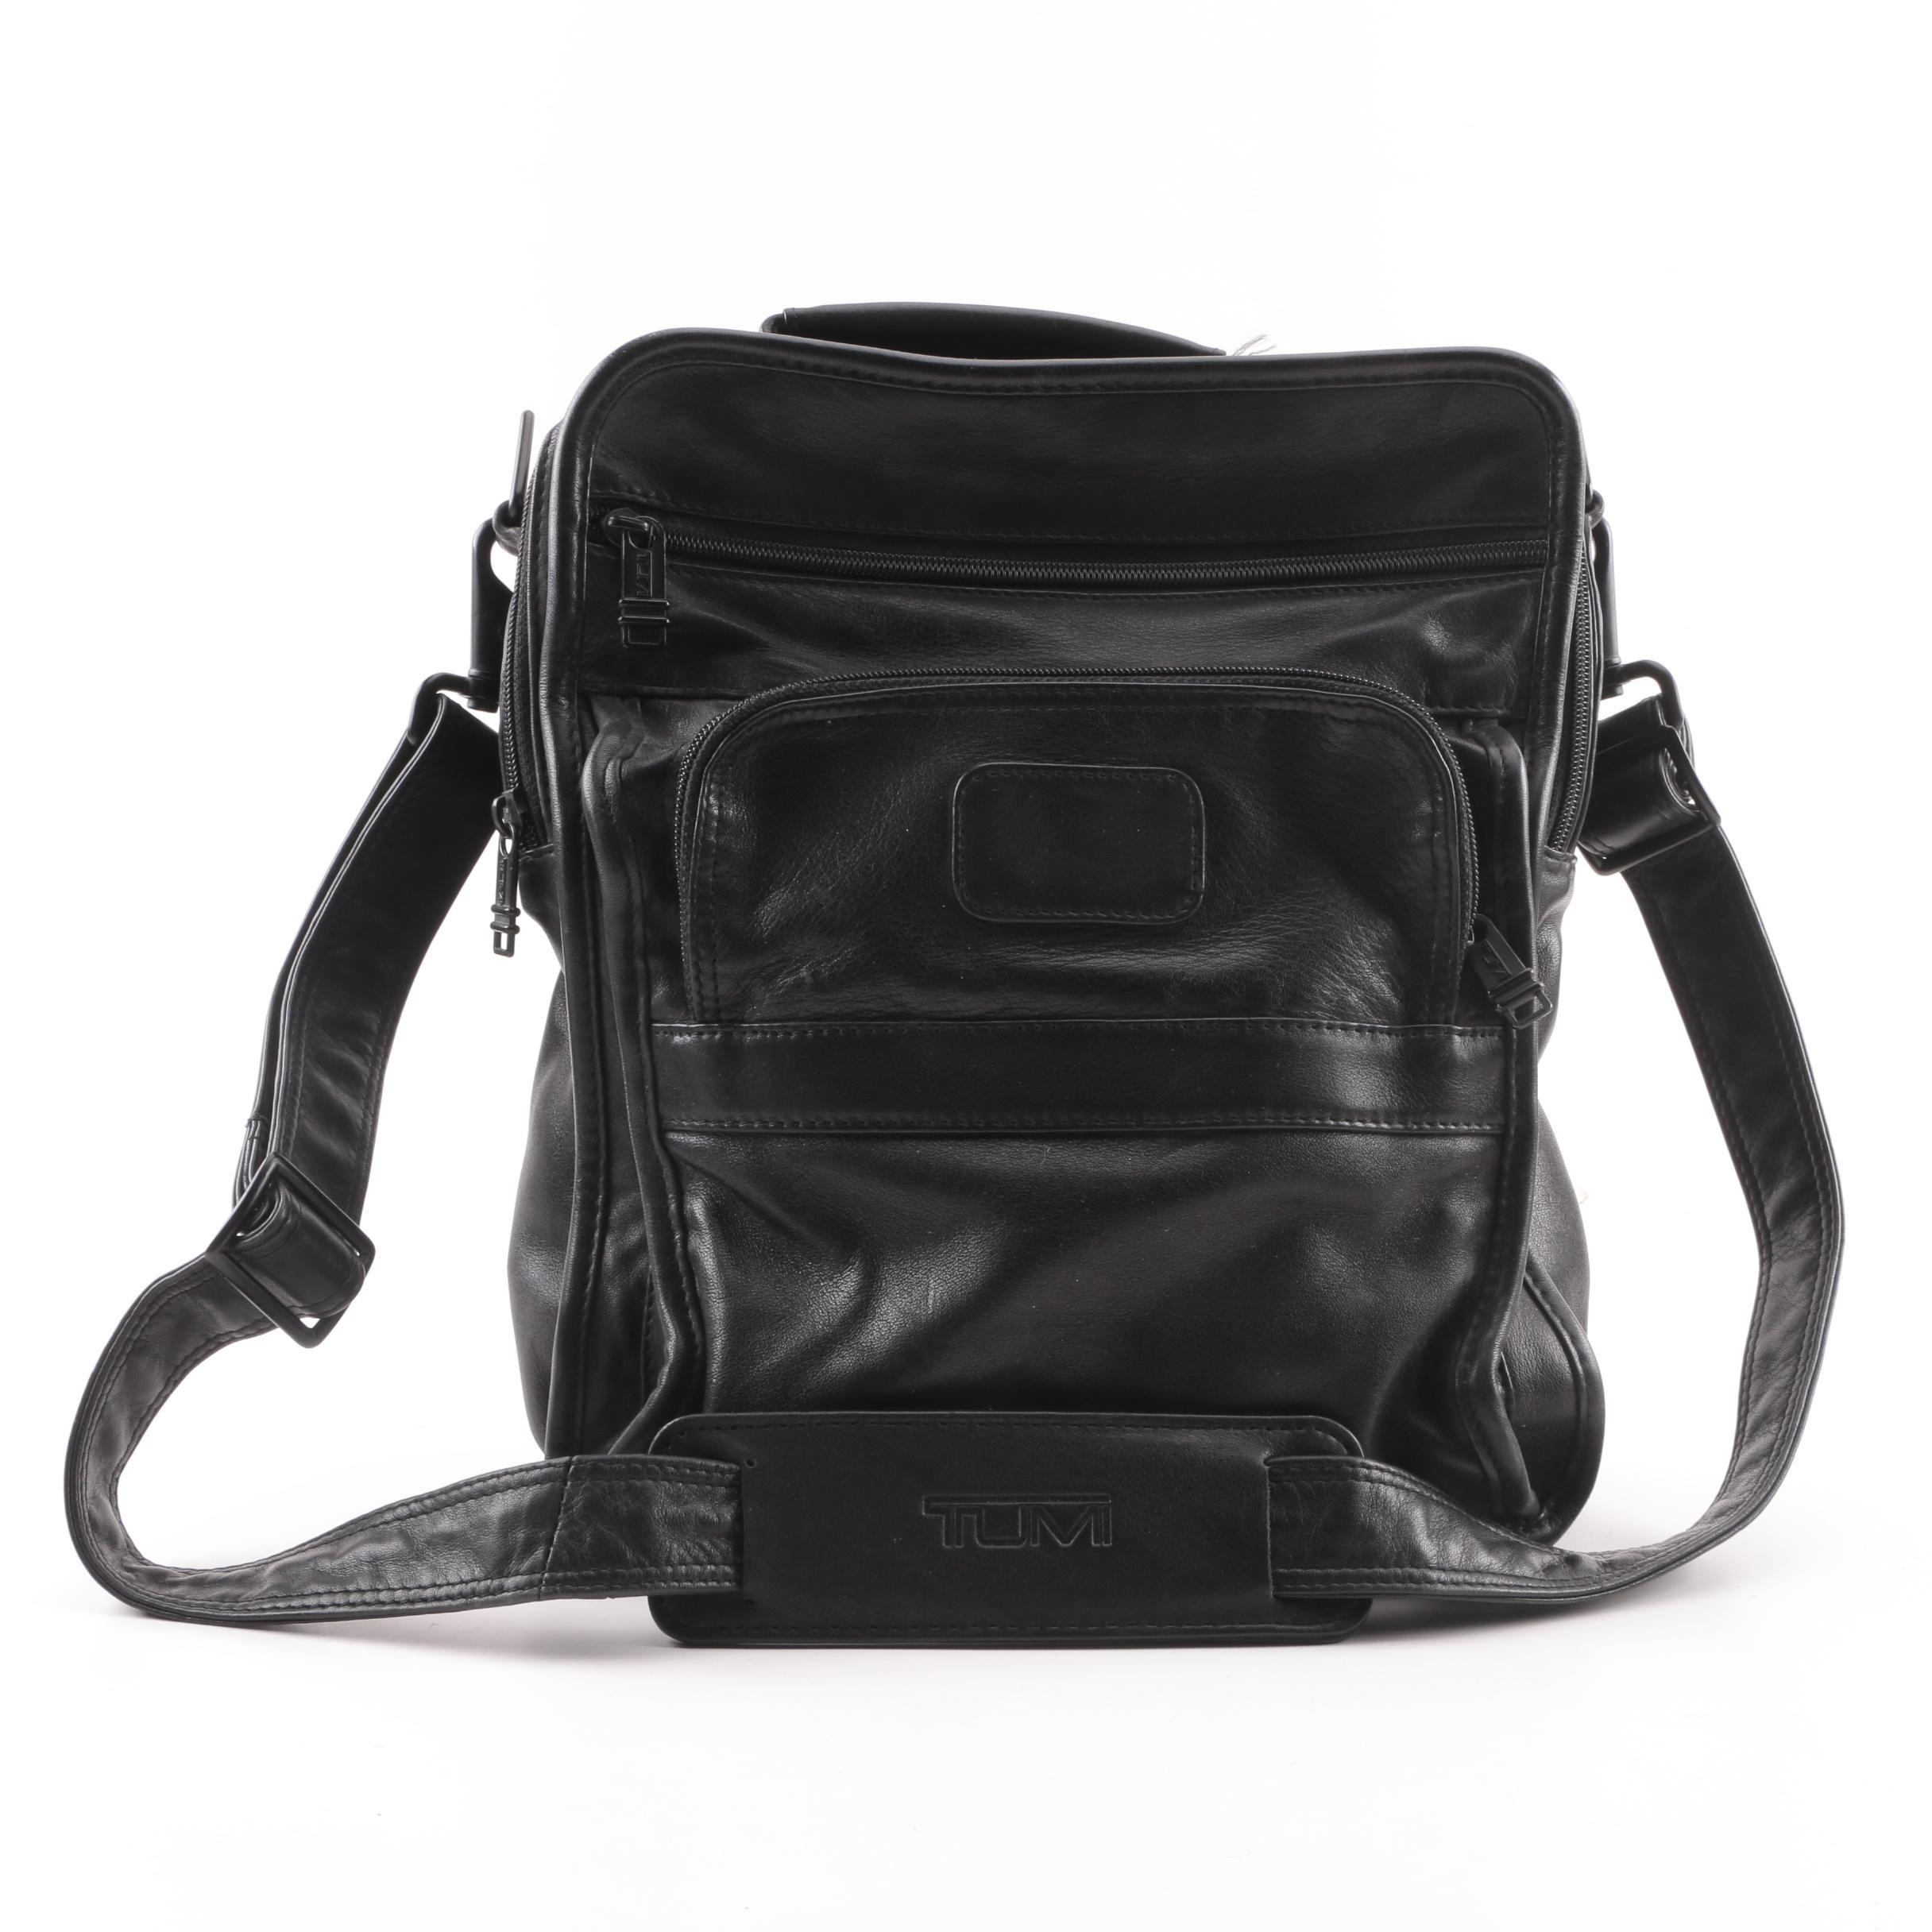 Tumi Black Leather Travel/Storage Bag